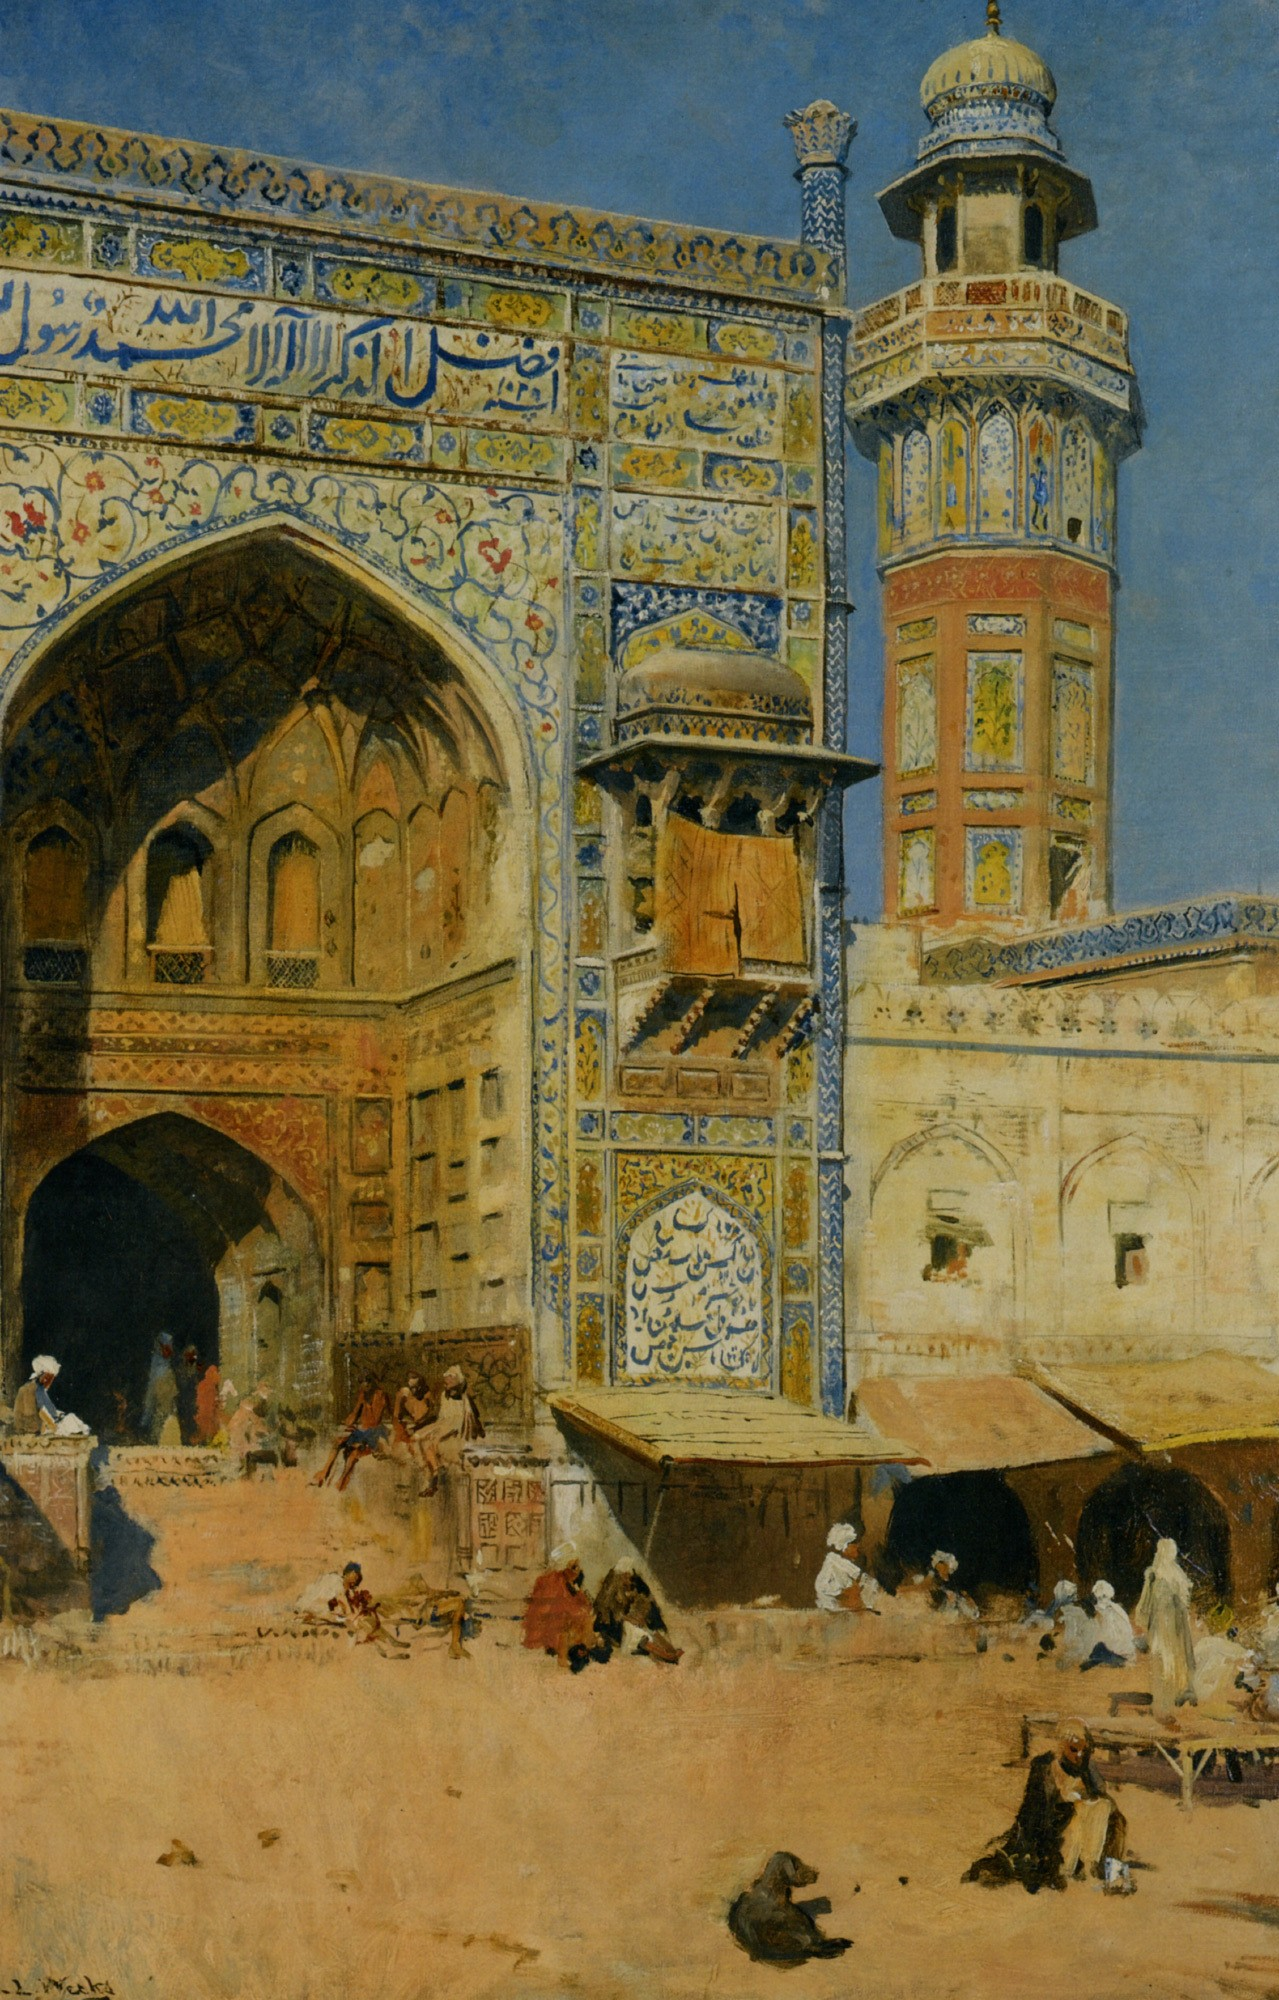 Jumma Masjid, Lahore India, 1899 Painting by Edwin Lord Weeks, American, 1849 - 1903